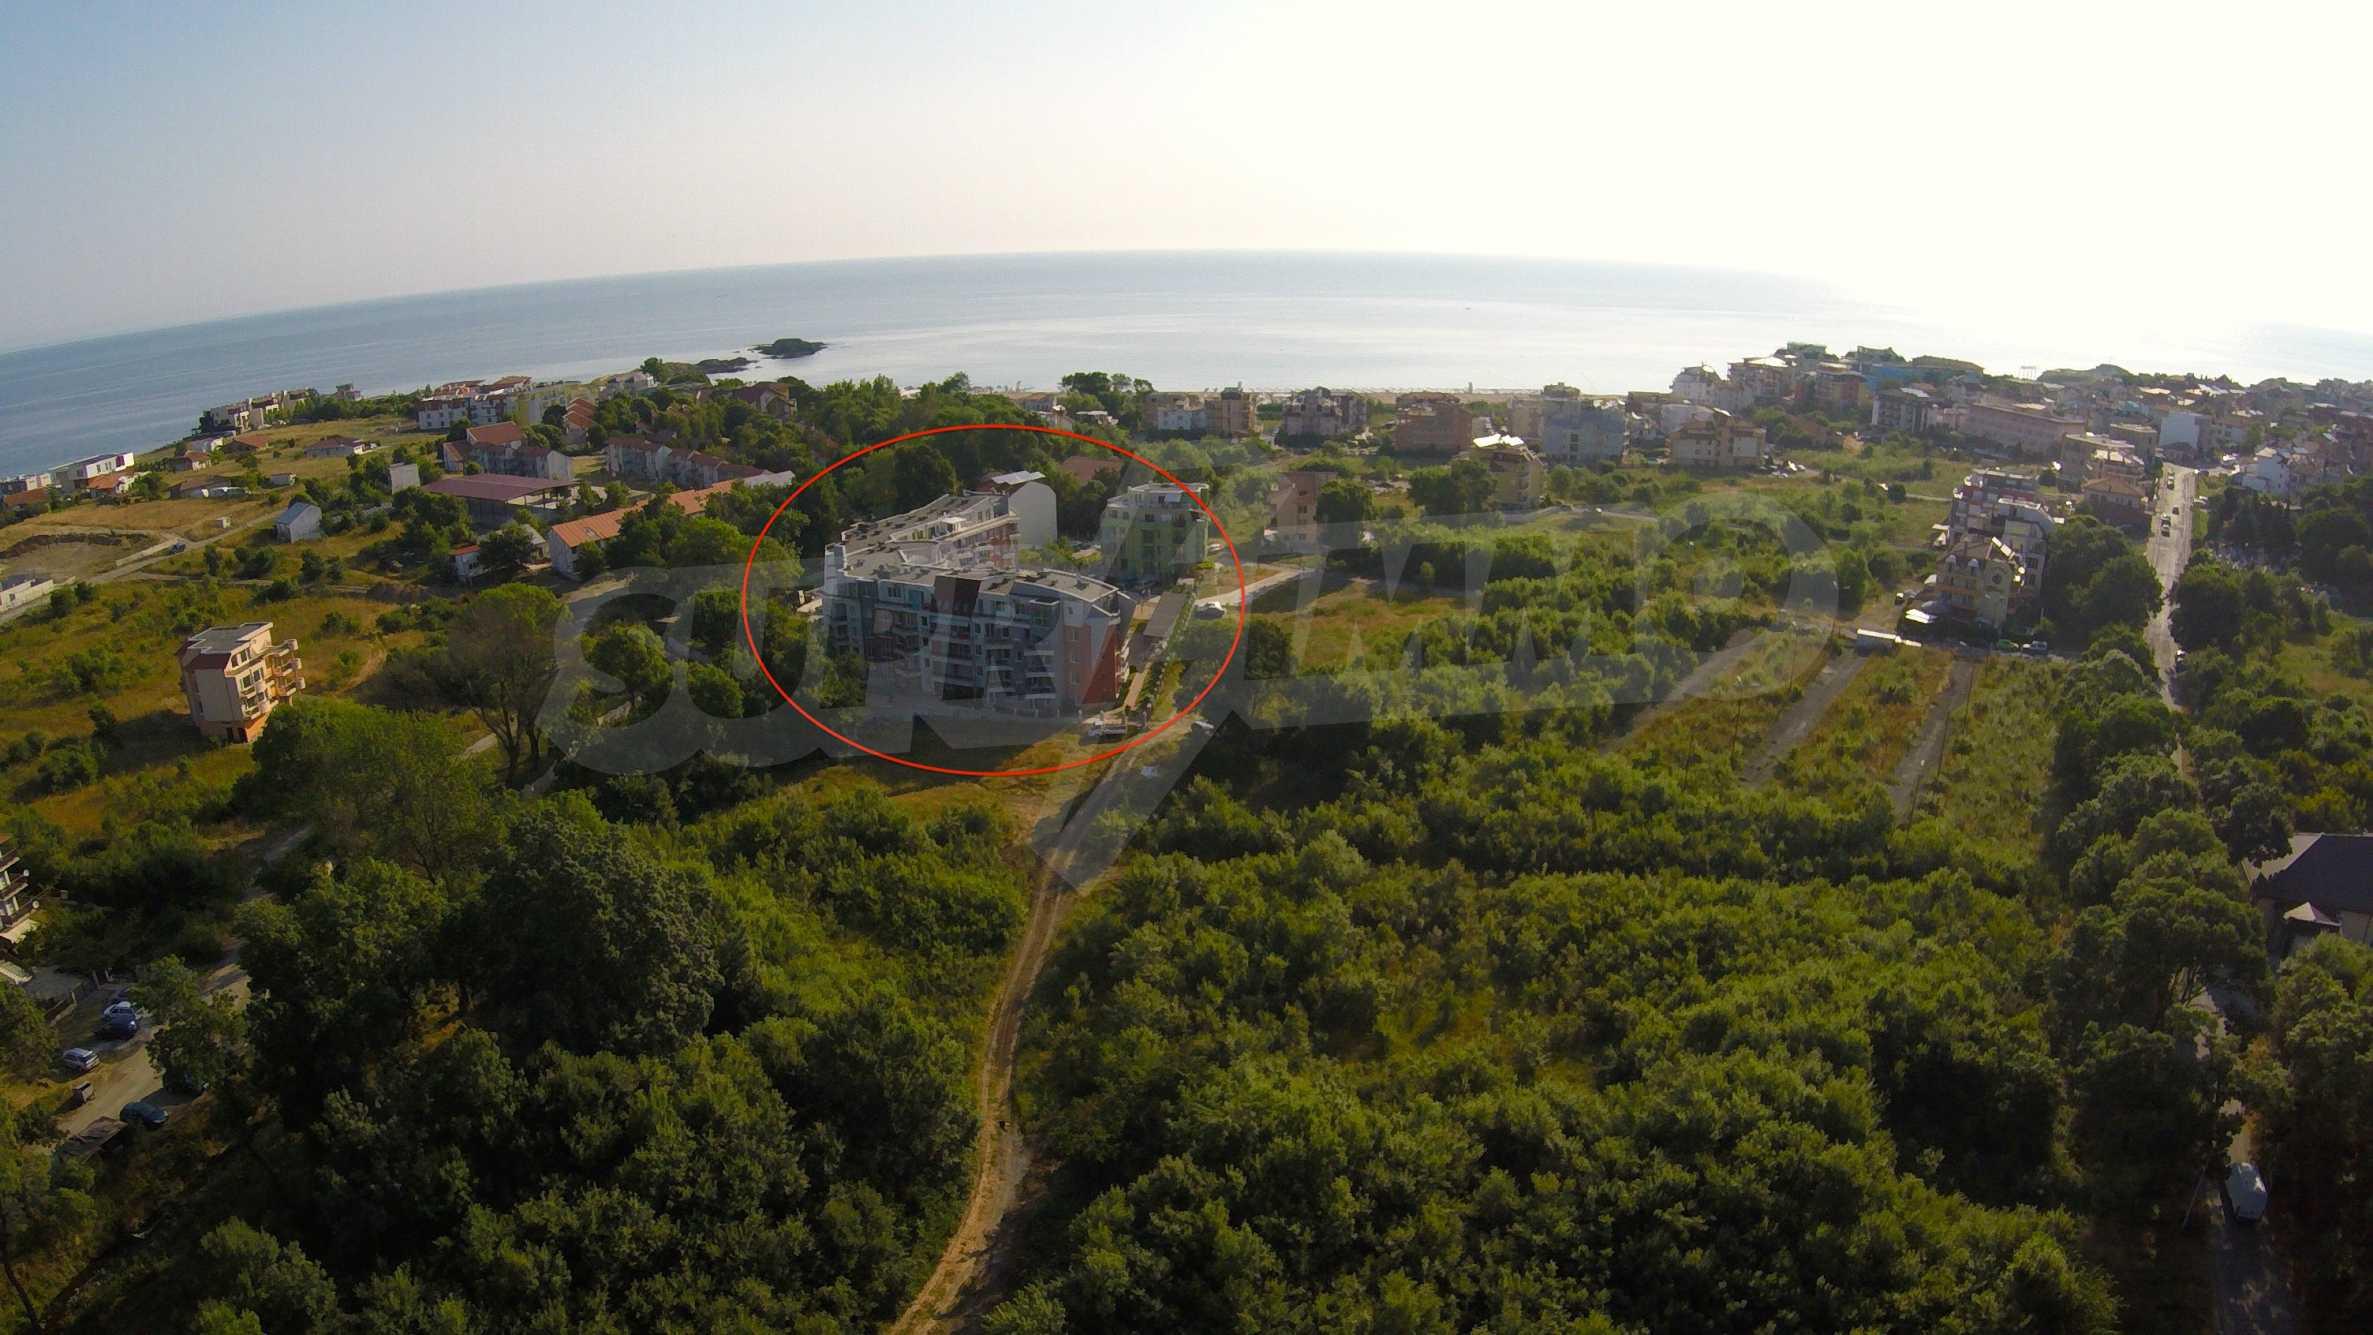 Трехкомнатный апартамент на продажу в комплексе Emberli в курорте Лозенец 35